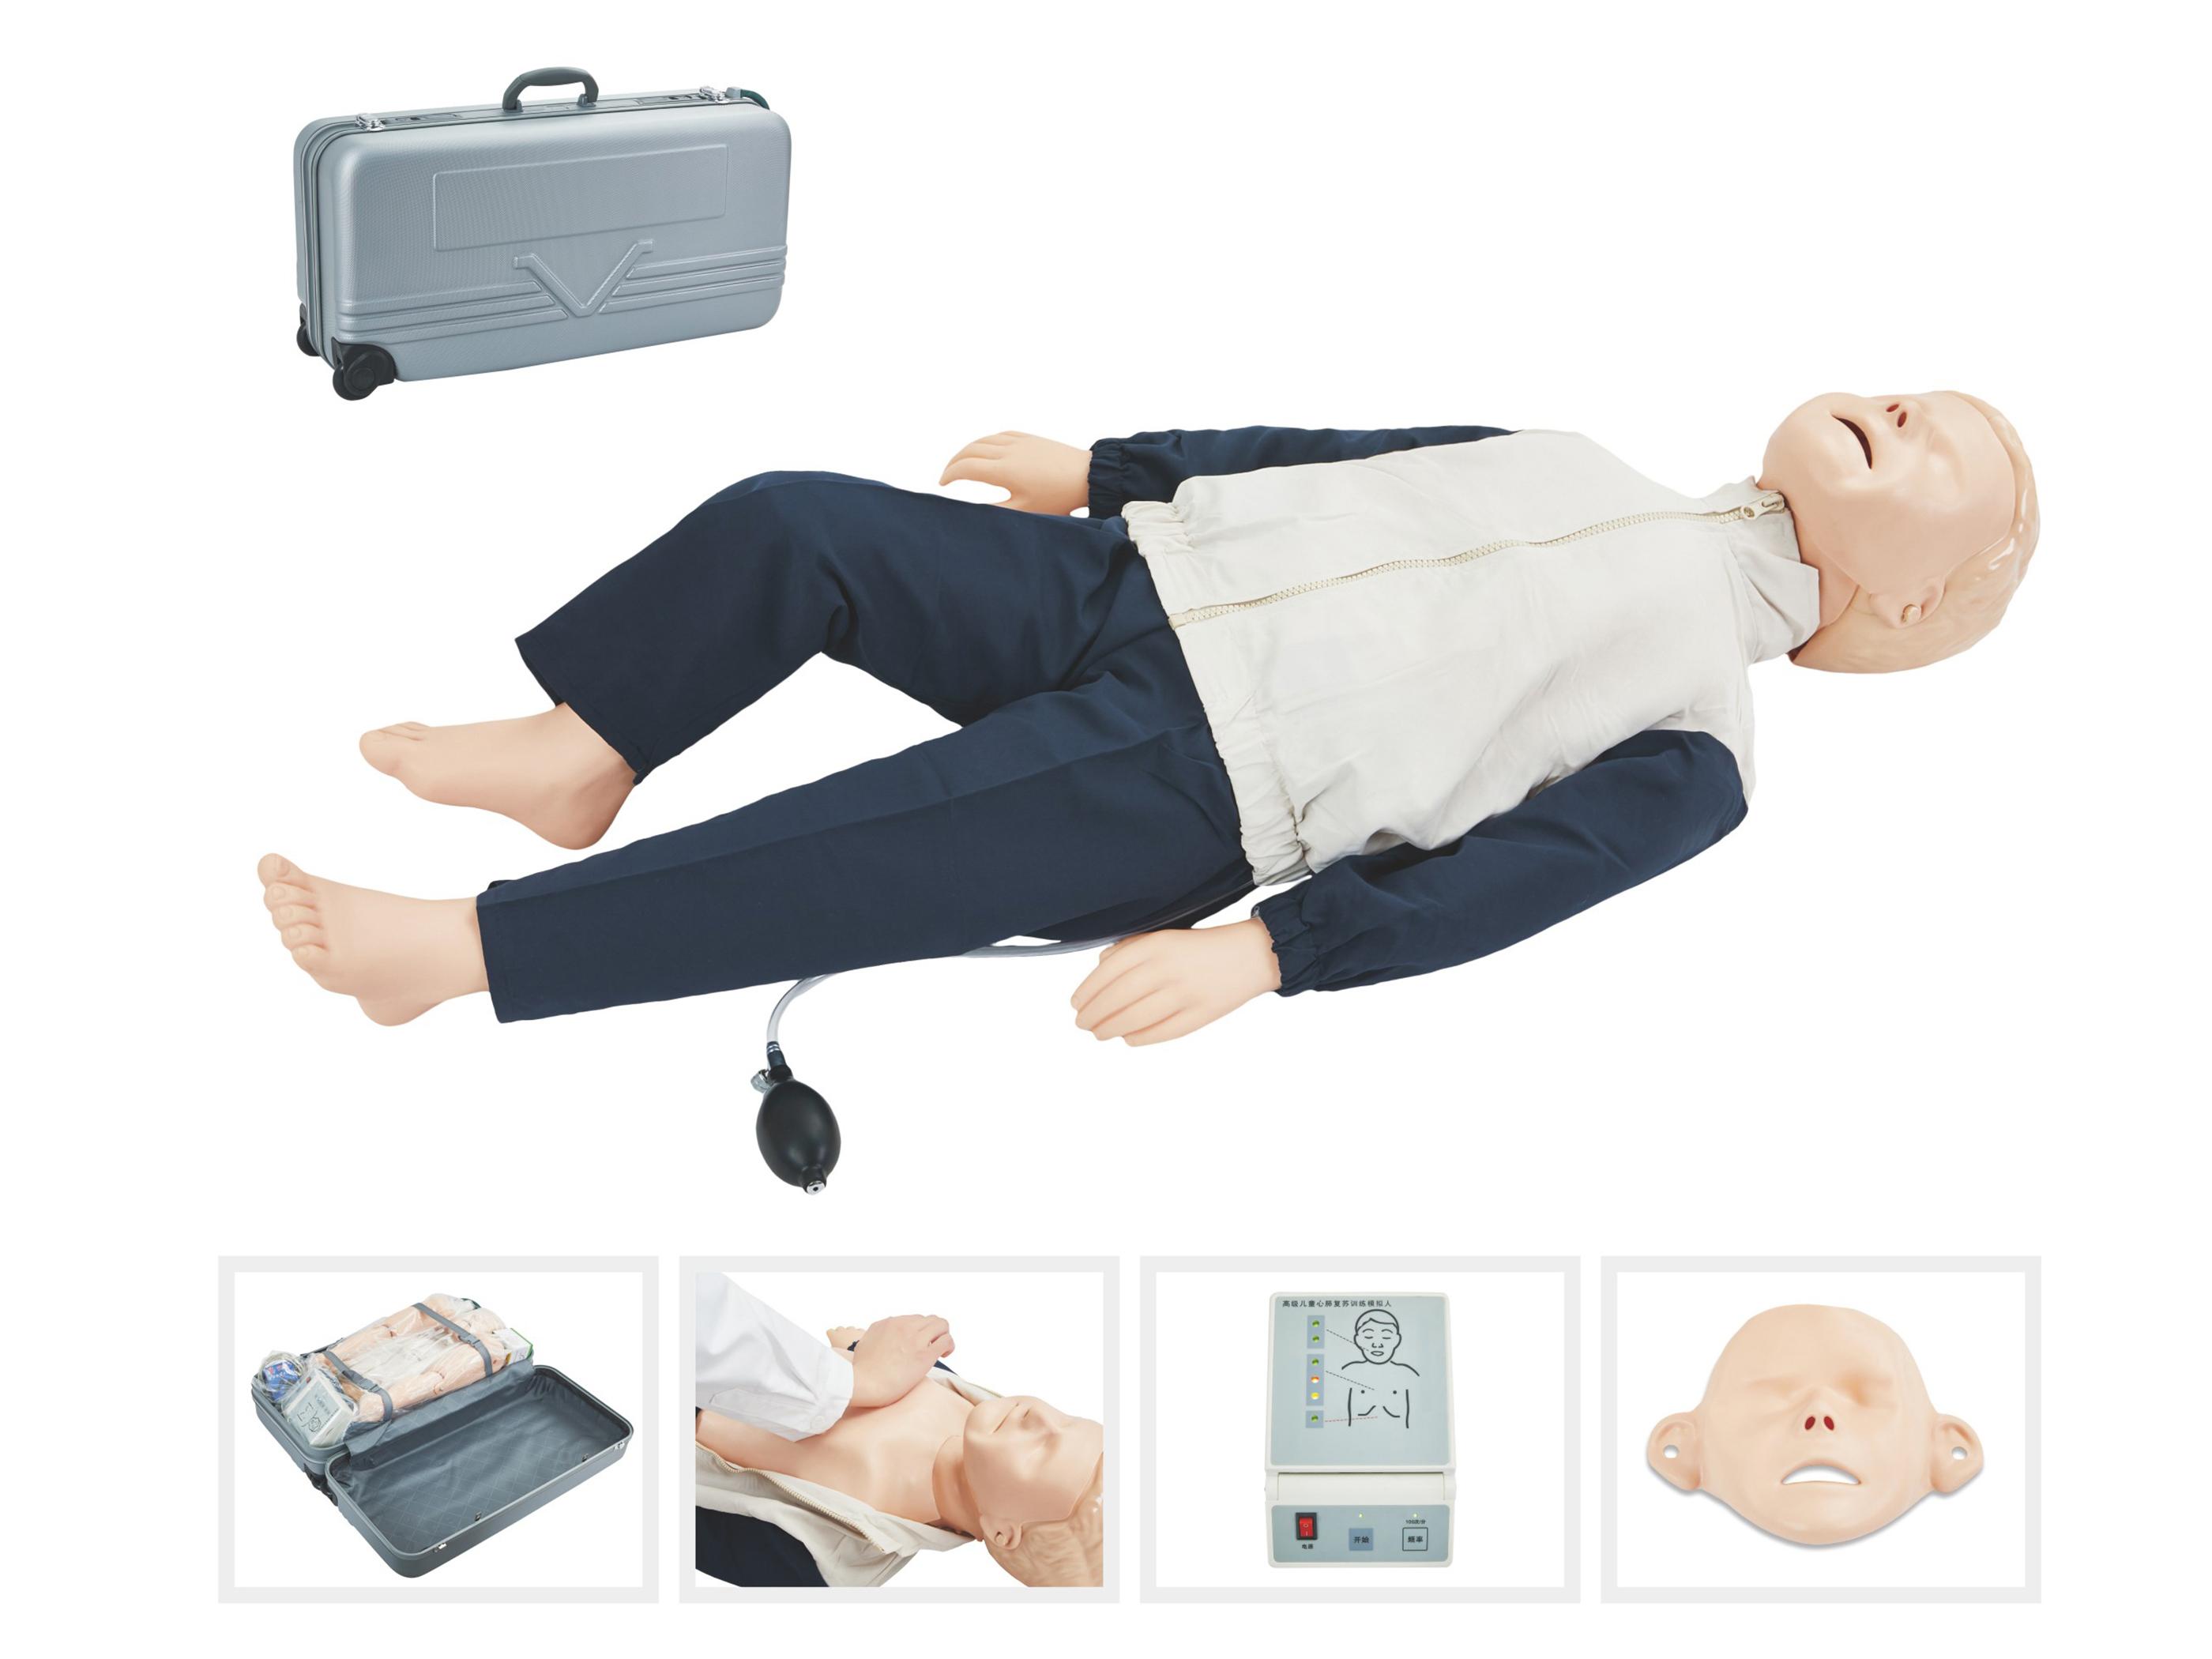 CPR15170高级儿童心肺复苏模拟人